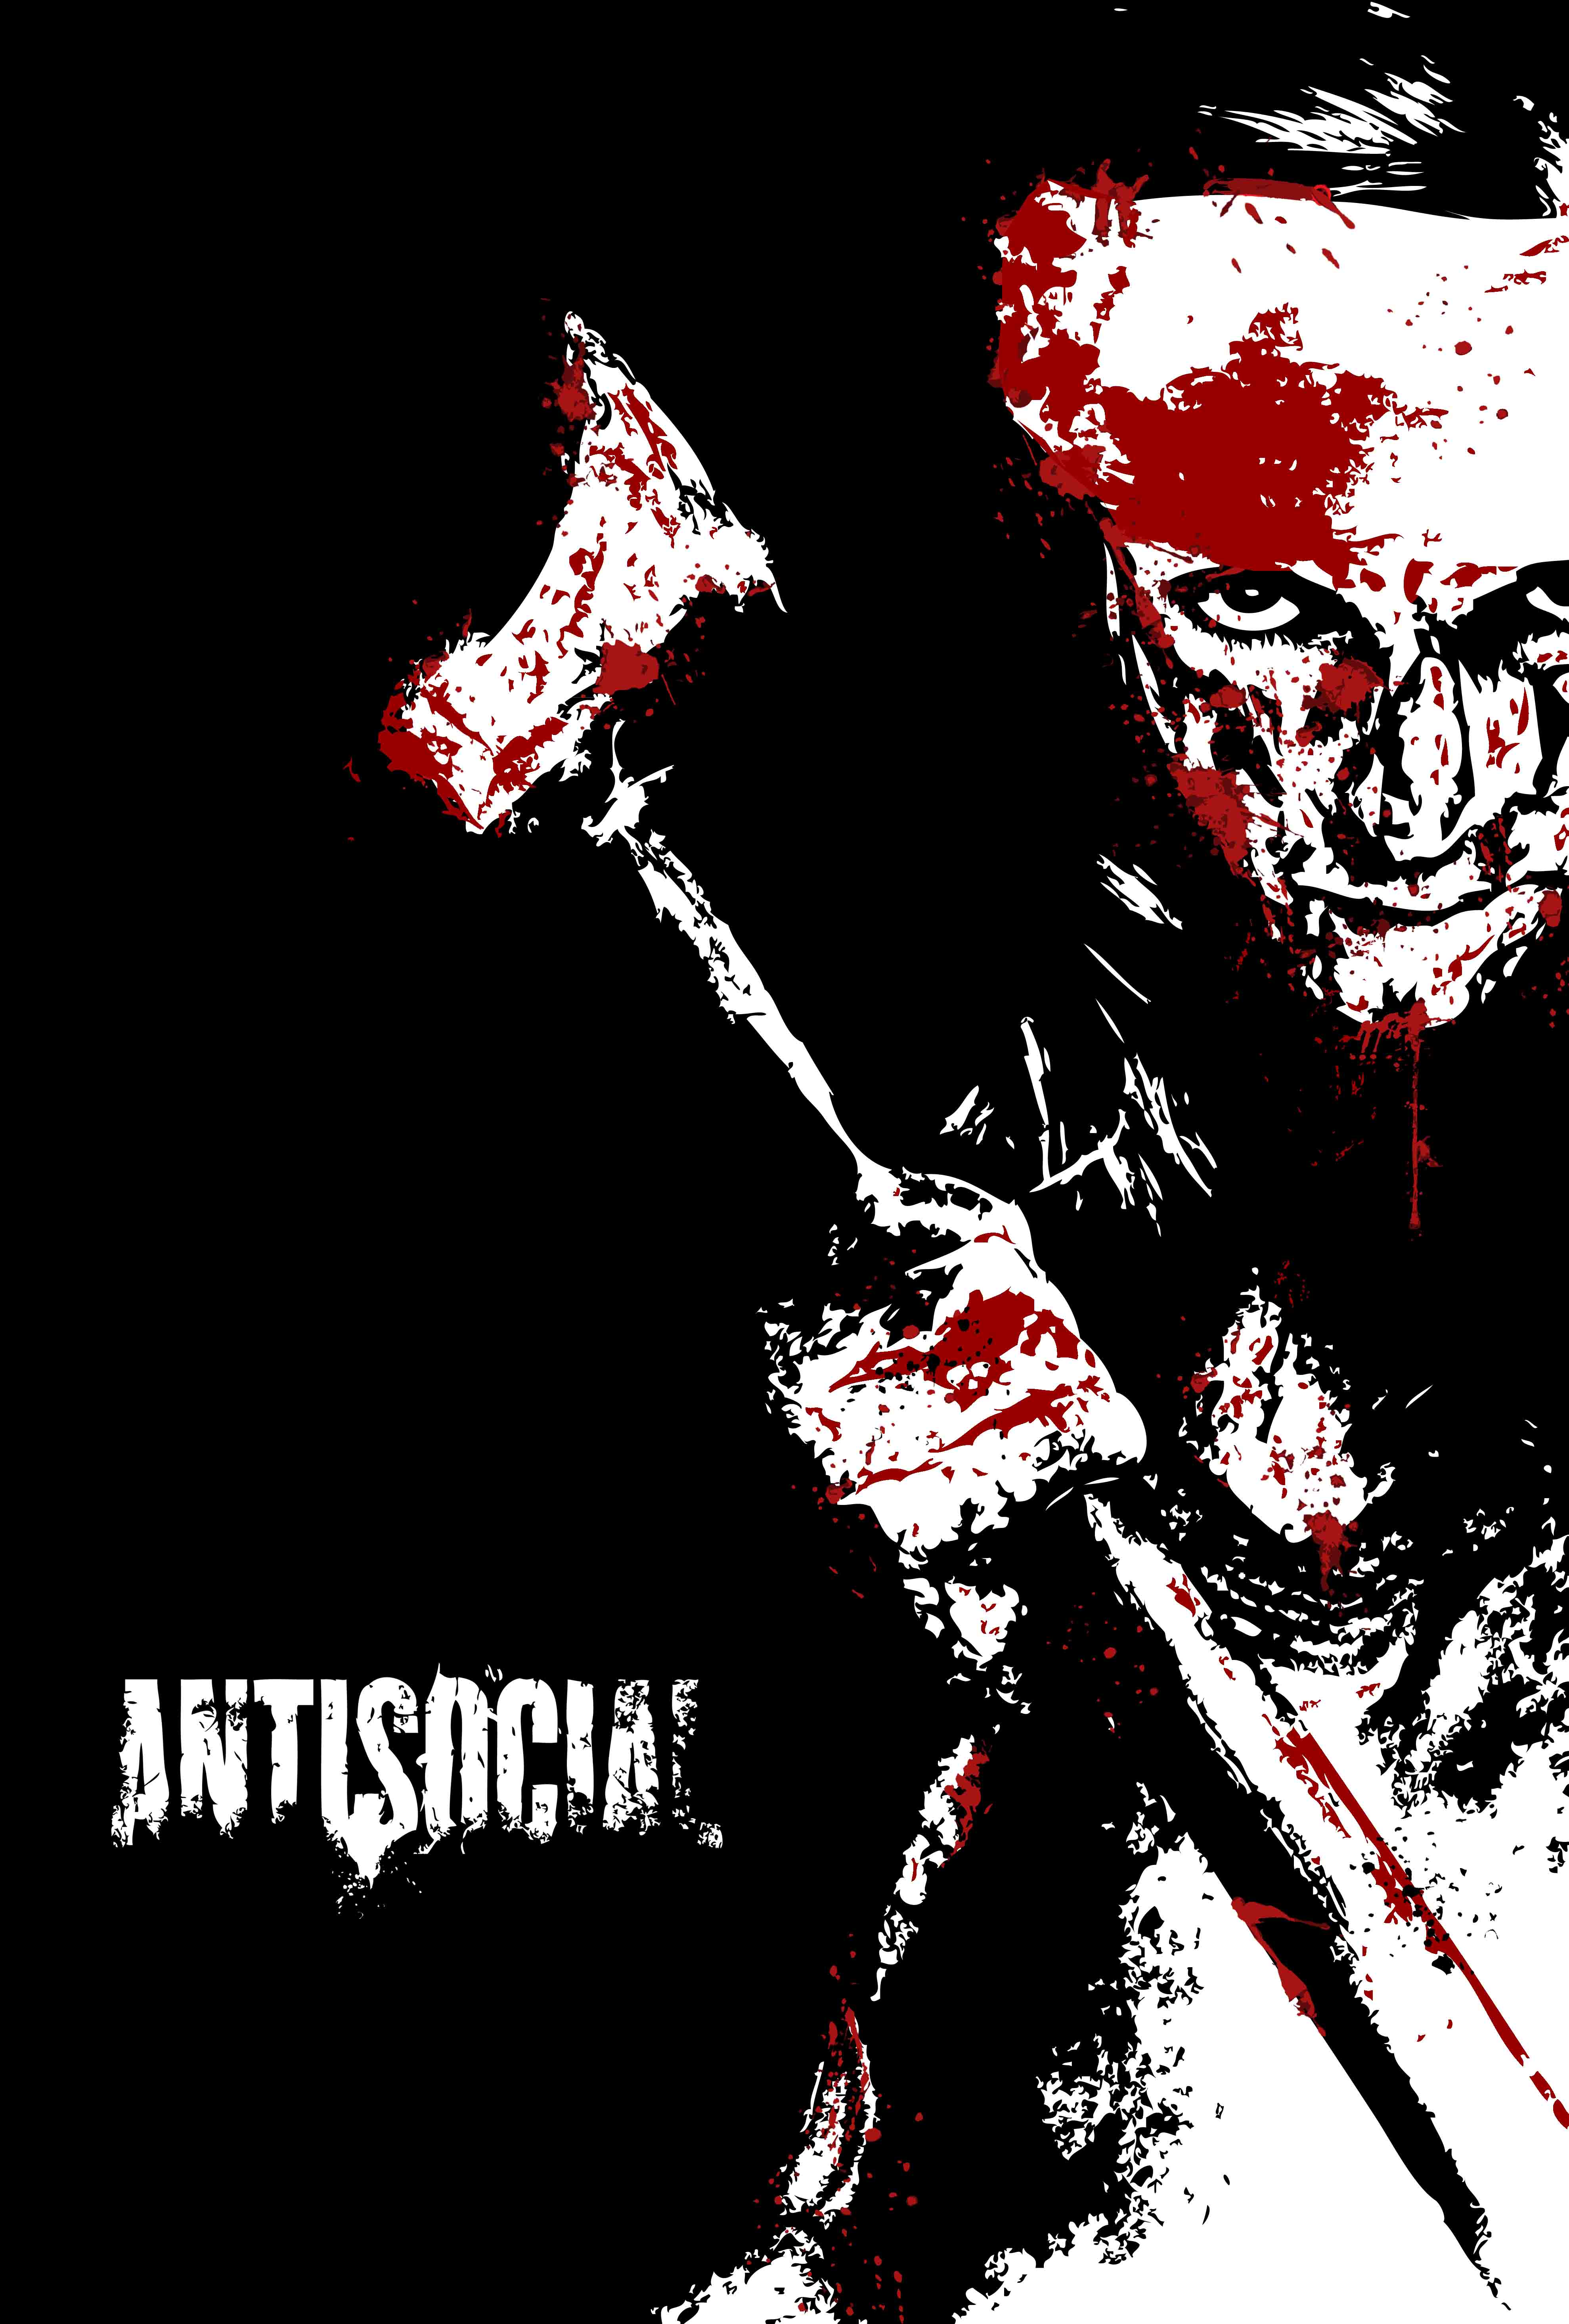 Antisocial-1